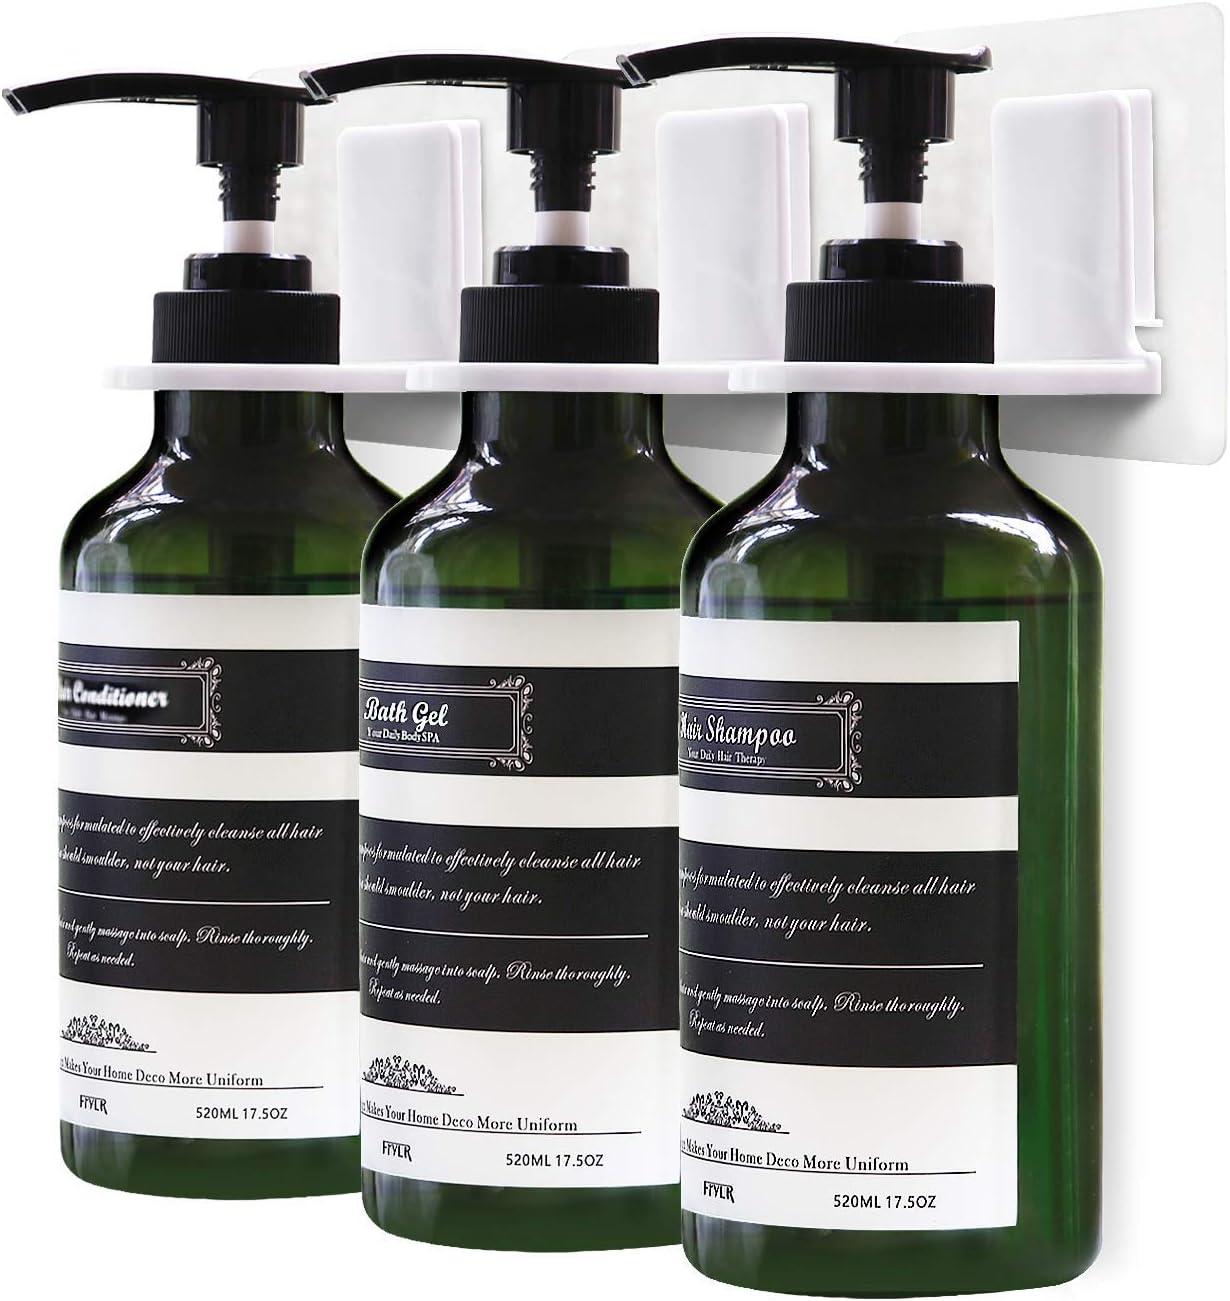 Frylr 3-Chamber Soap Dispenser, Wall Mount Shower Pump, 3 x 17.5 Oz, PET Plastic Bottles, Stick Without Drilling, Water Resistant Sticker, Dark Green : Home & Kitchen